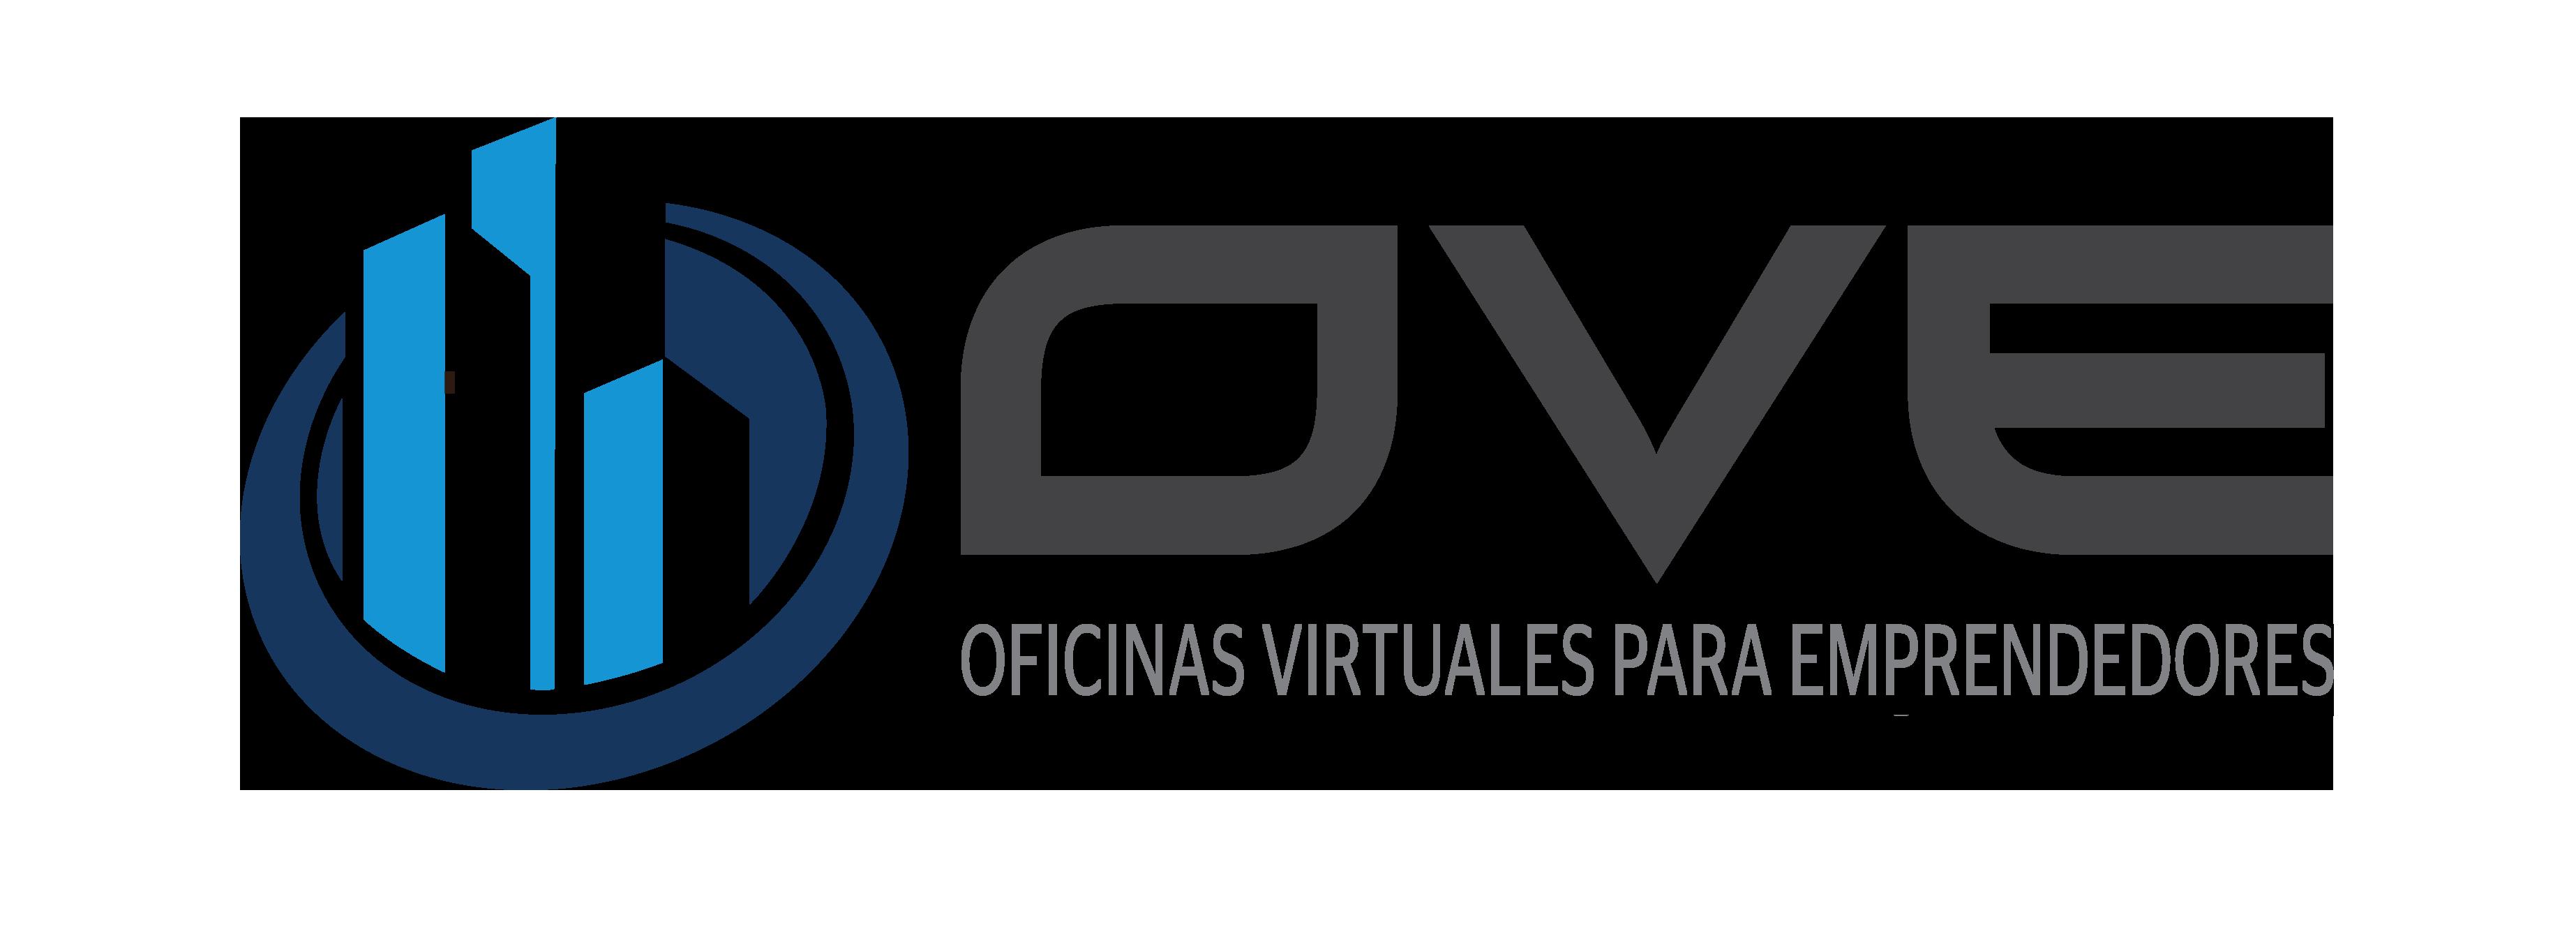 OVE - Oficinas Virtuales para Emprendedores